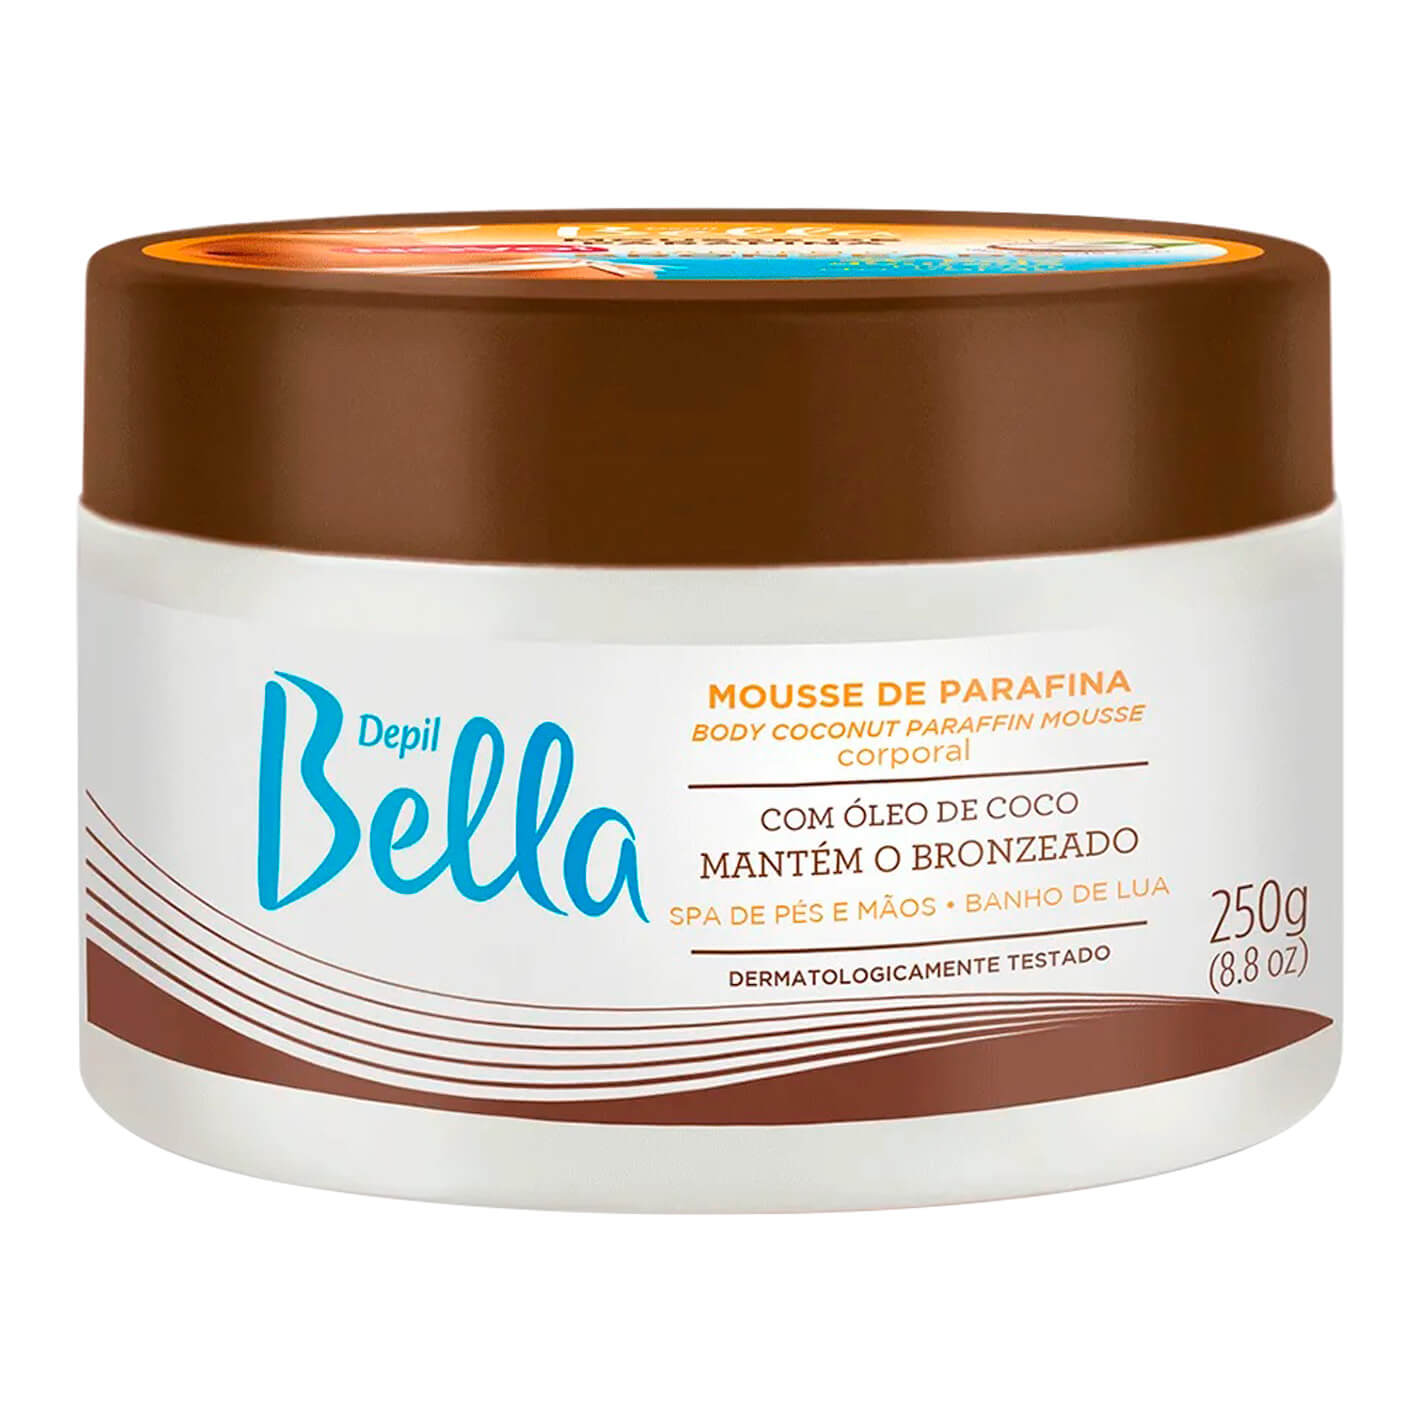 Mousse de Parafina Com Óleo de Coco Depil Bella 250g